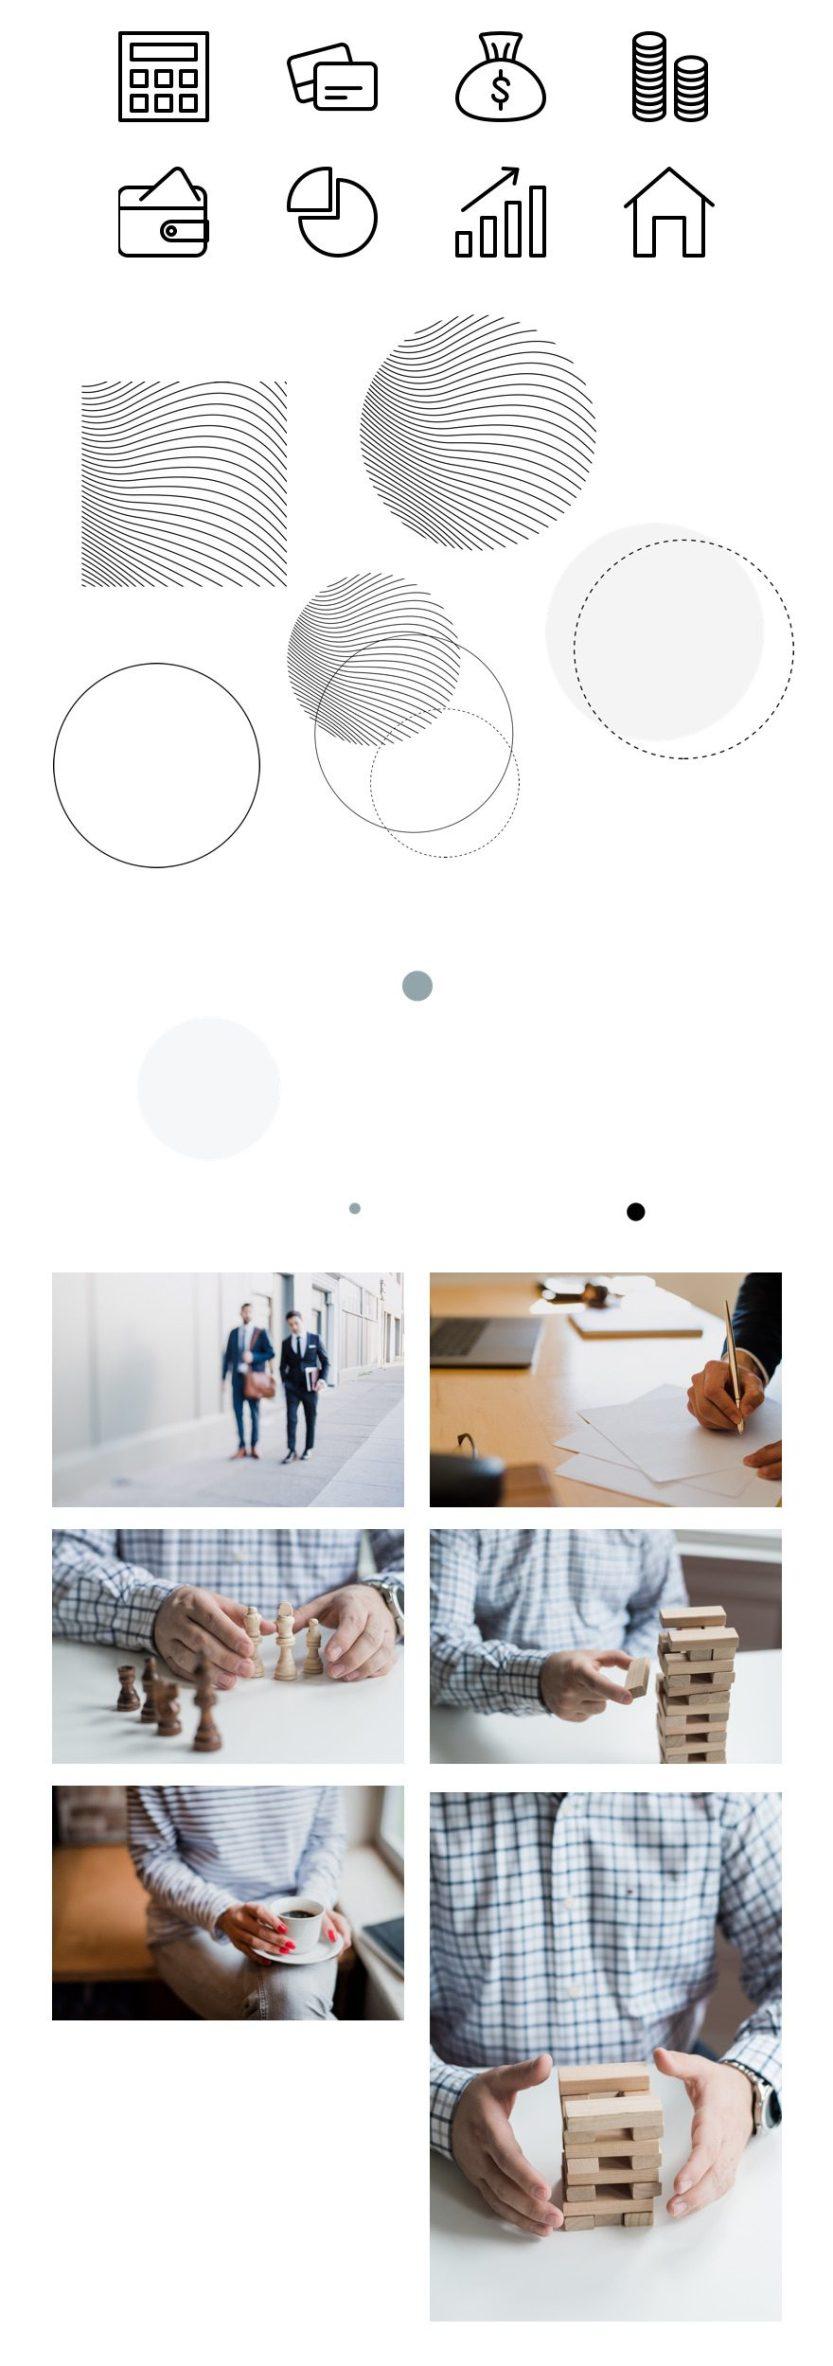 divi estate planning layout pack